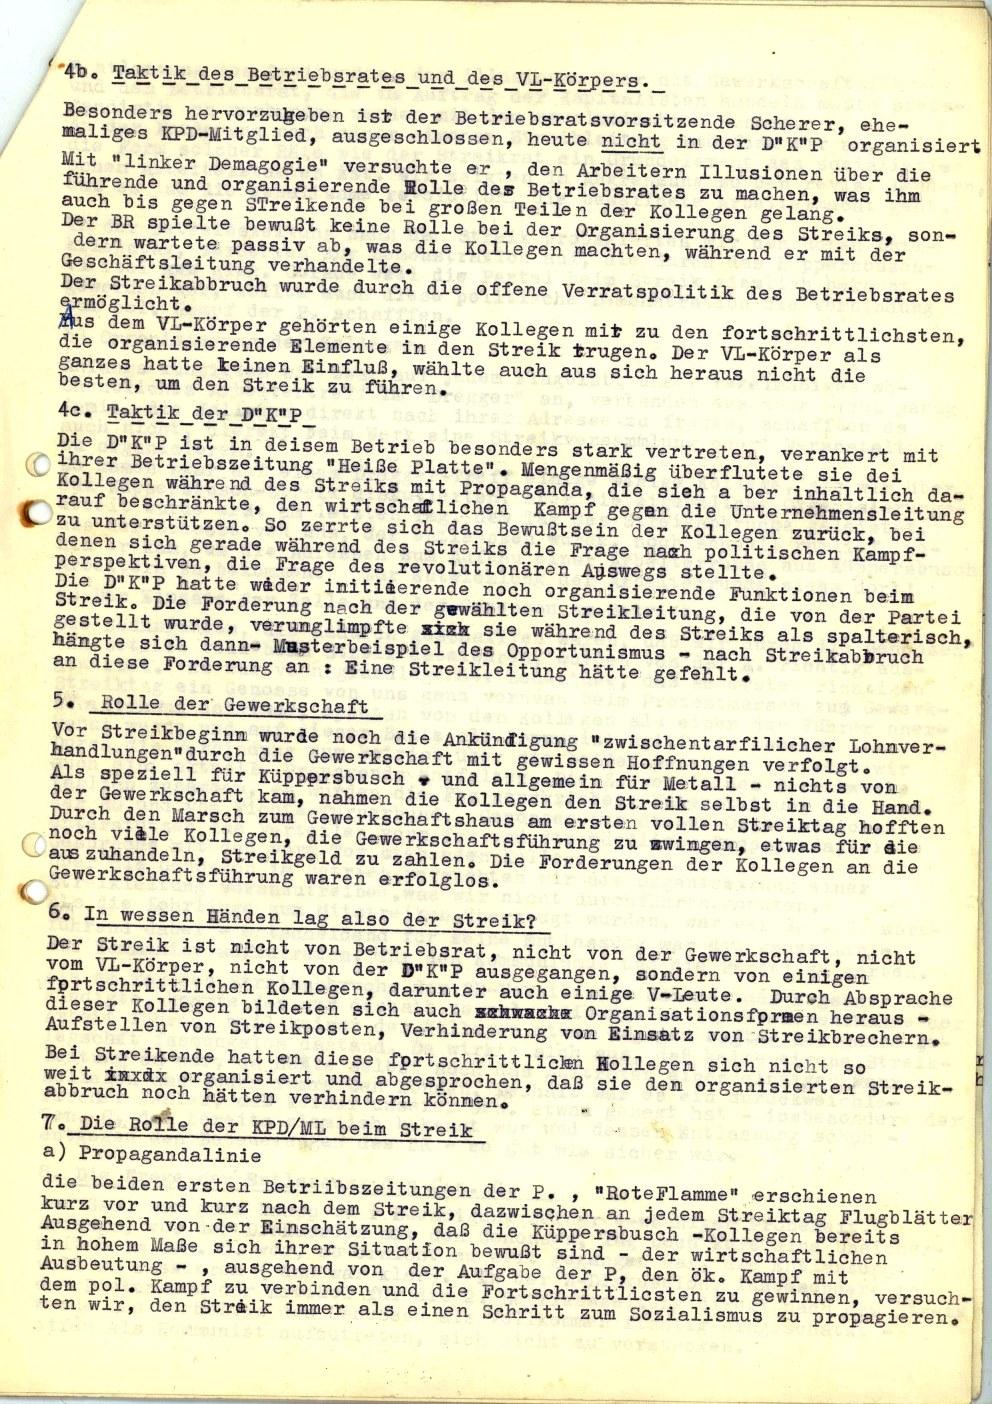 Streikbericht_KPD_ML_1973_02